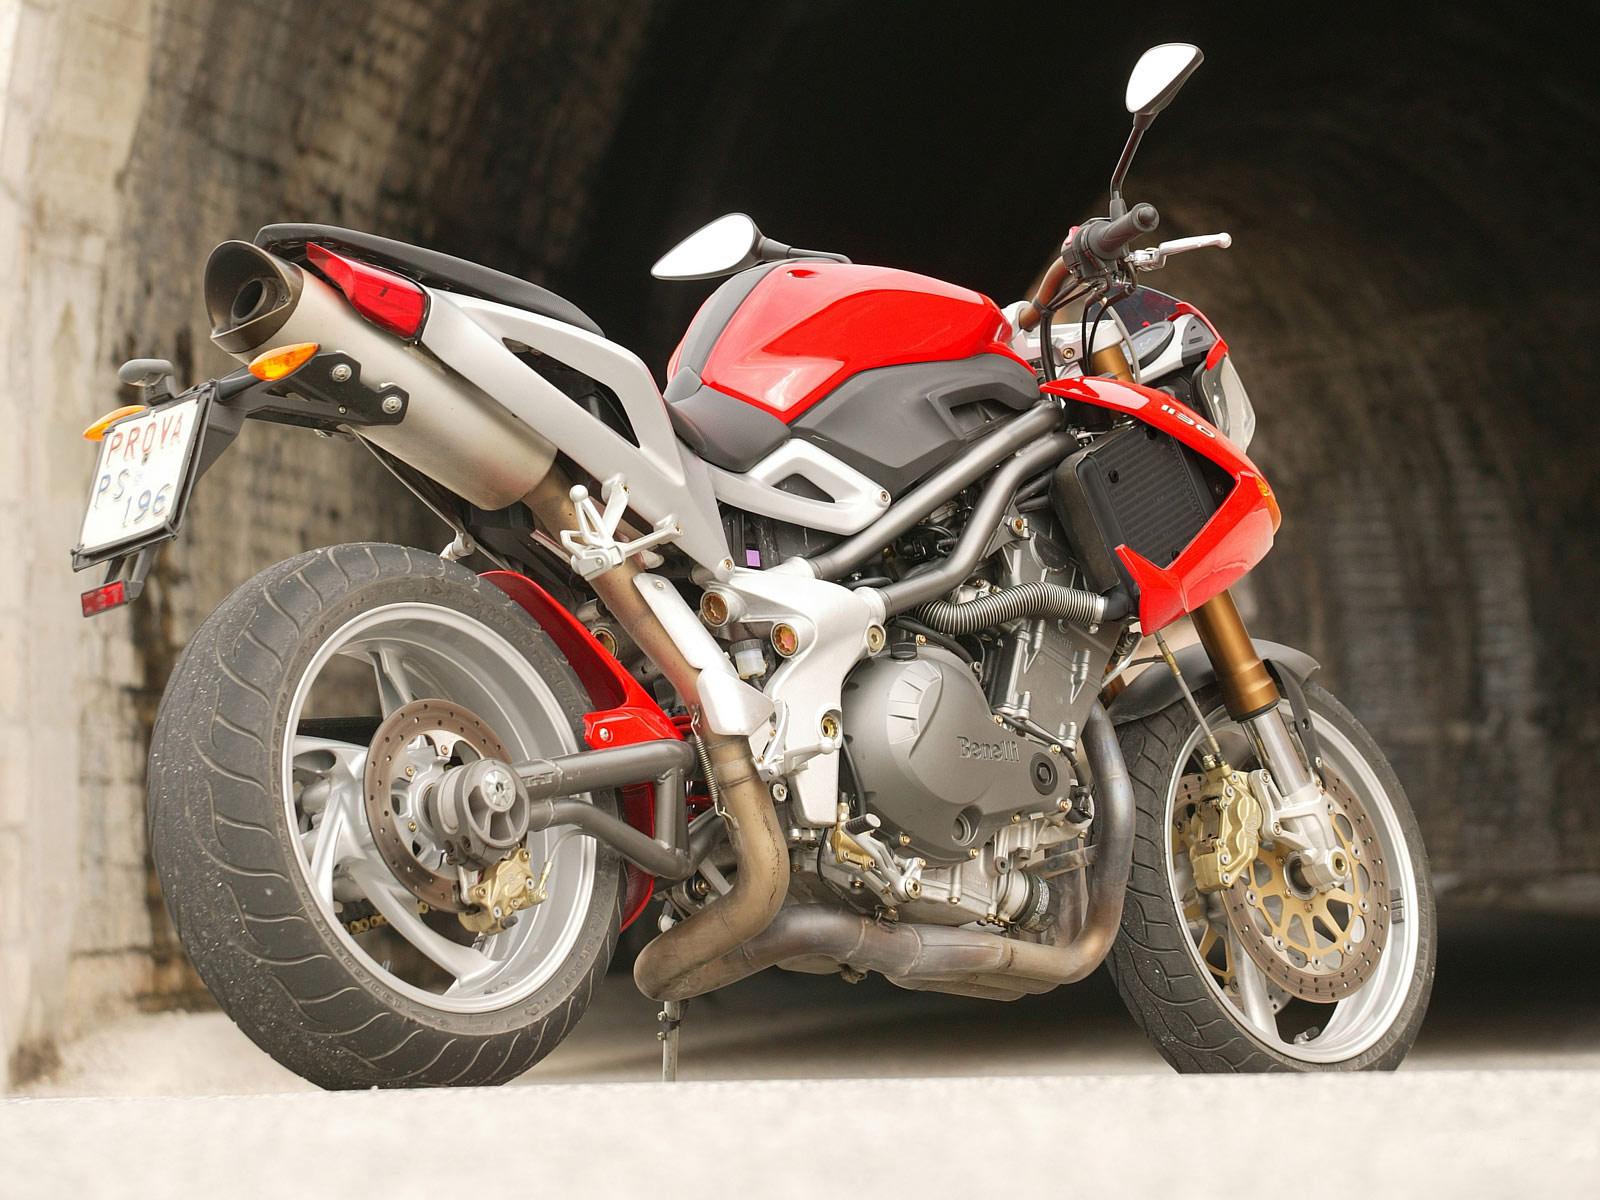 http://4.bp.blogspot.com/-8WG19mAibt0/Tr29Iqy33iI/AAAAAAAADyQ/FEo0tMzl3jI/s1600/2005_Benelli-TNT-1130_motorcycle-desktop-wallpaper_17.jpg